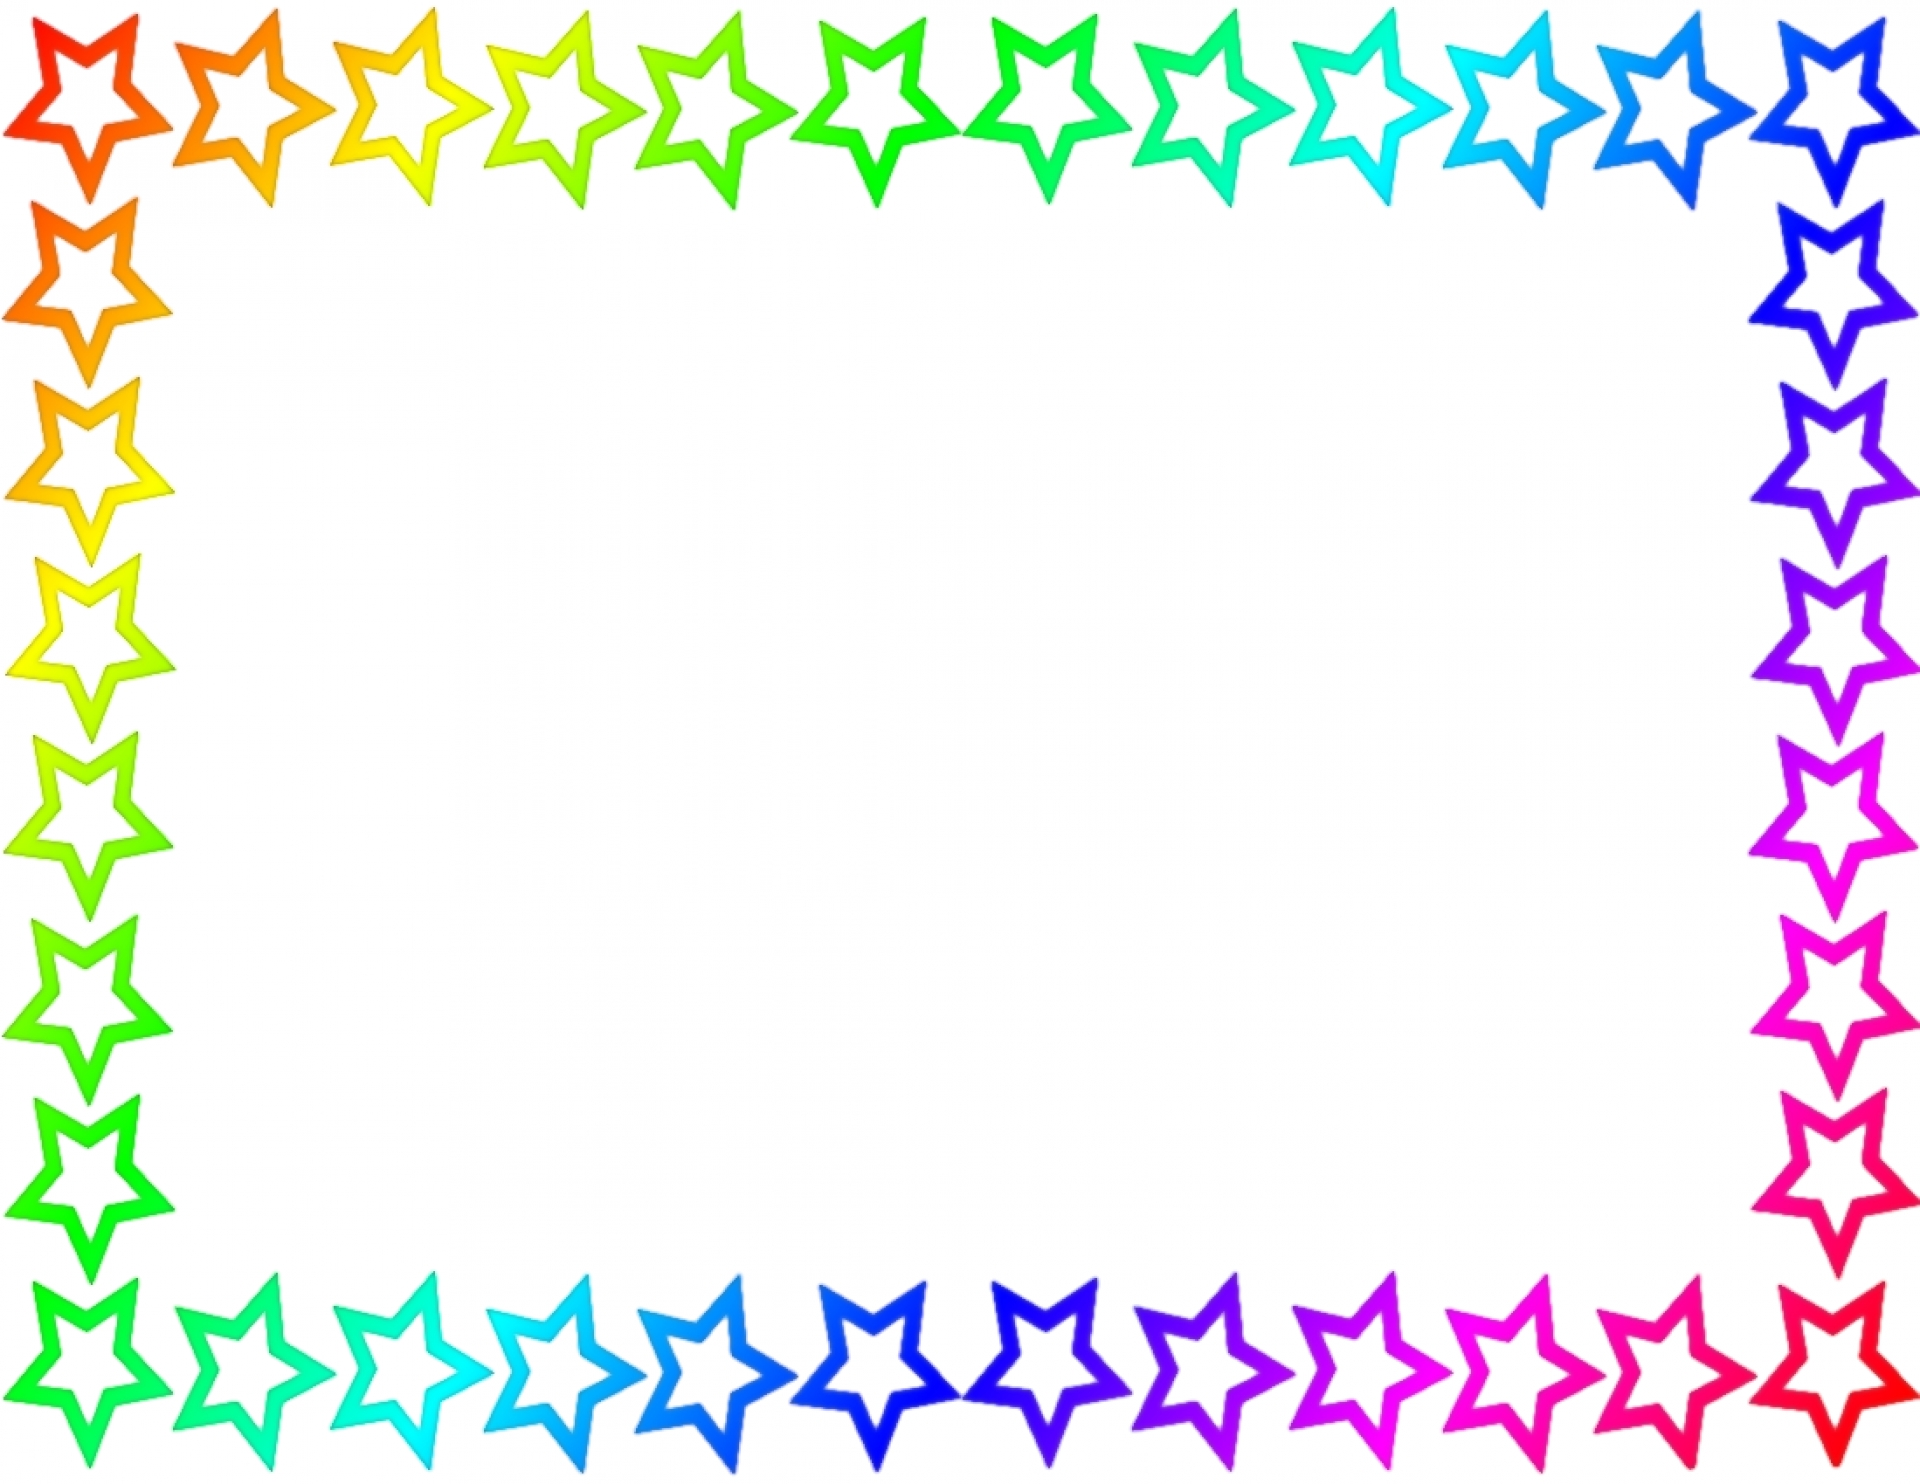 graphic download Microsoft clipart borders. Free cliparts download clip.